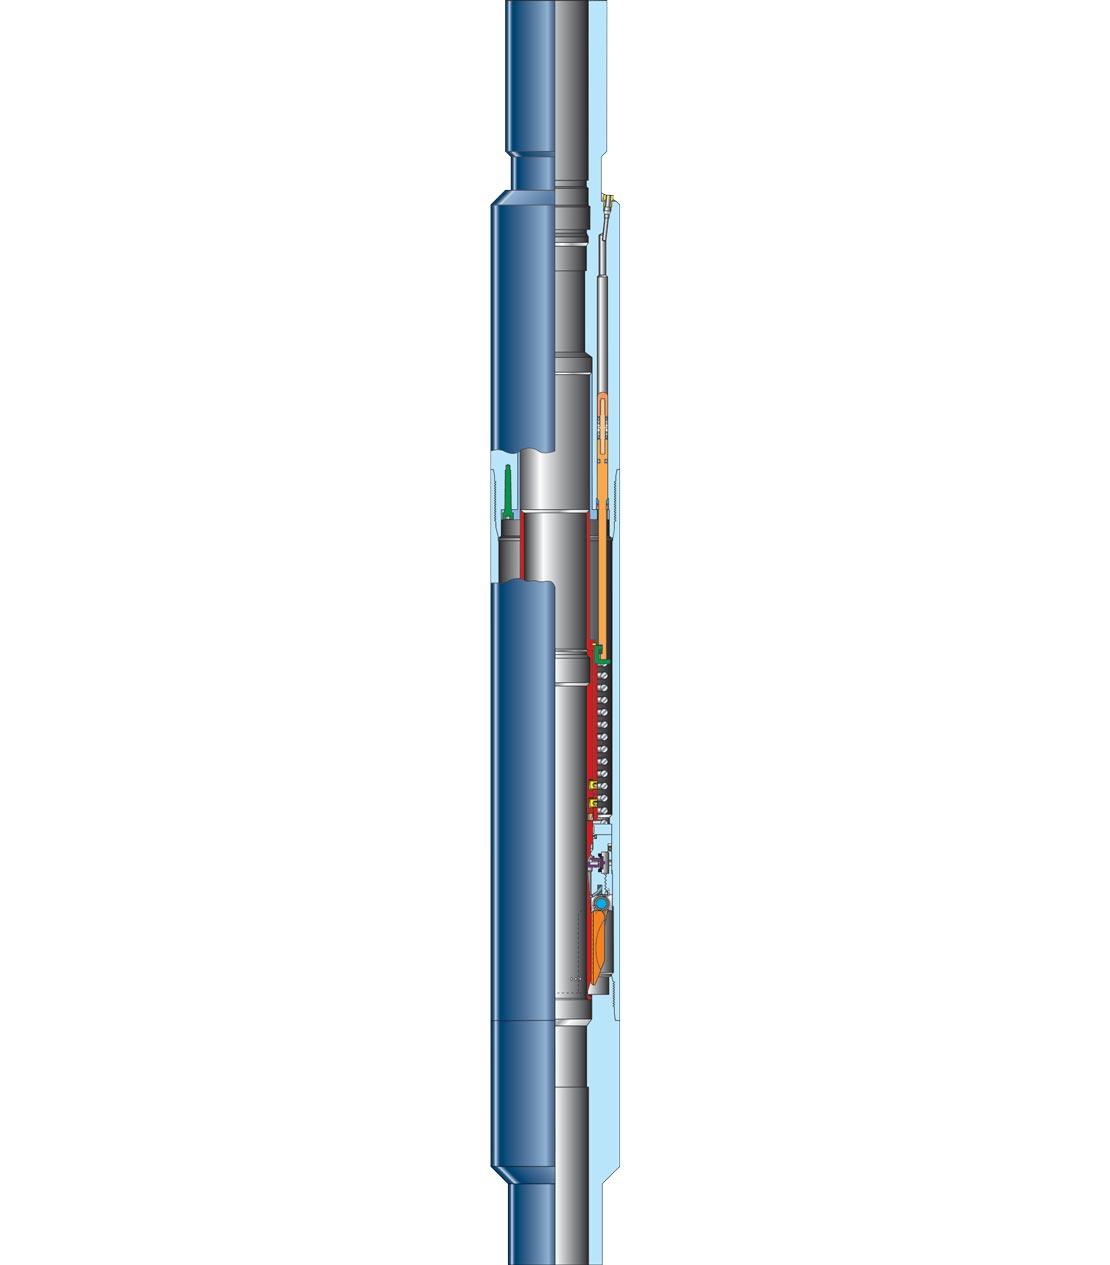 TRM-4 Series Reduced OD Safety Valves